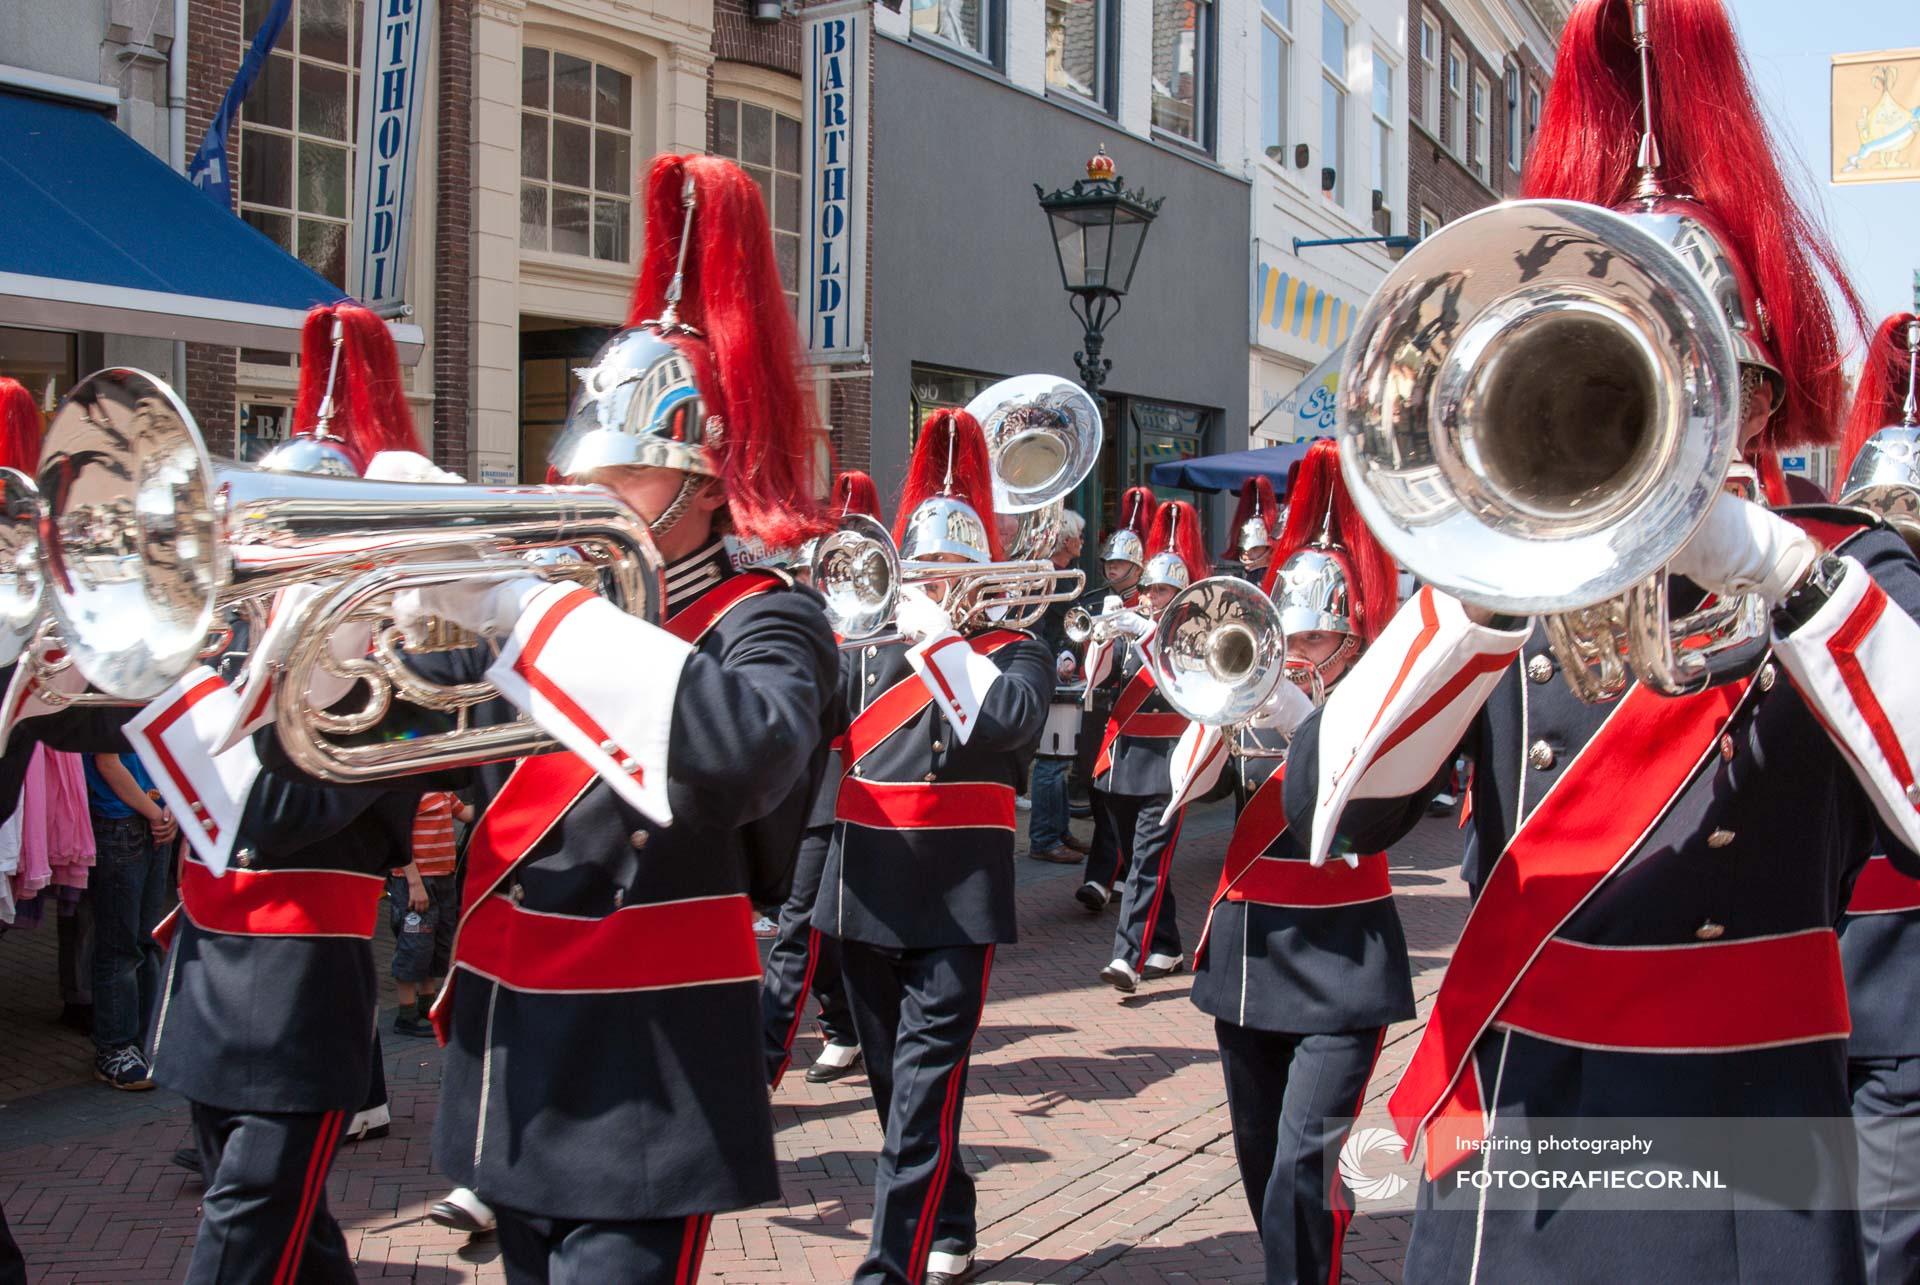 KTK | marchingband | Kampen | fotograaf | fotografie © Fotografiecor.nl